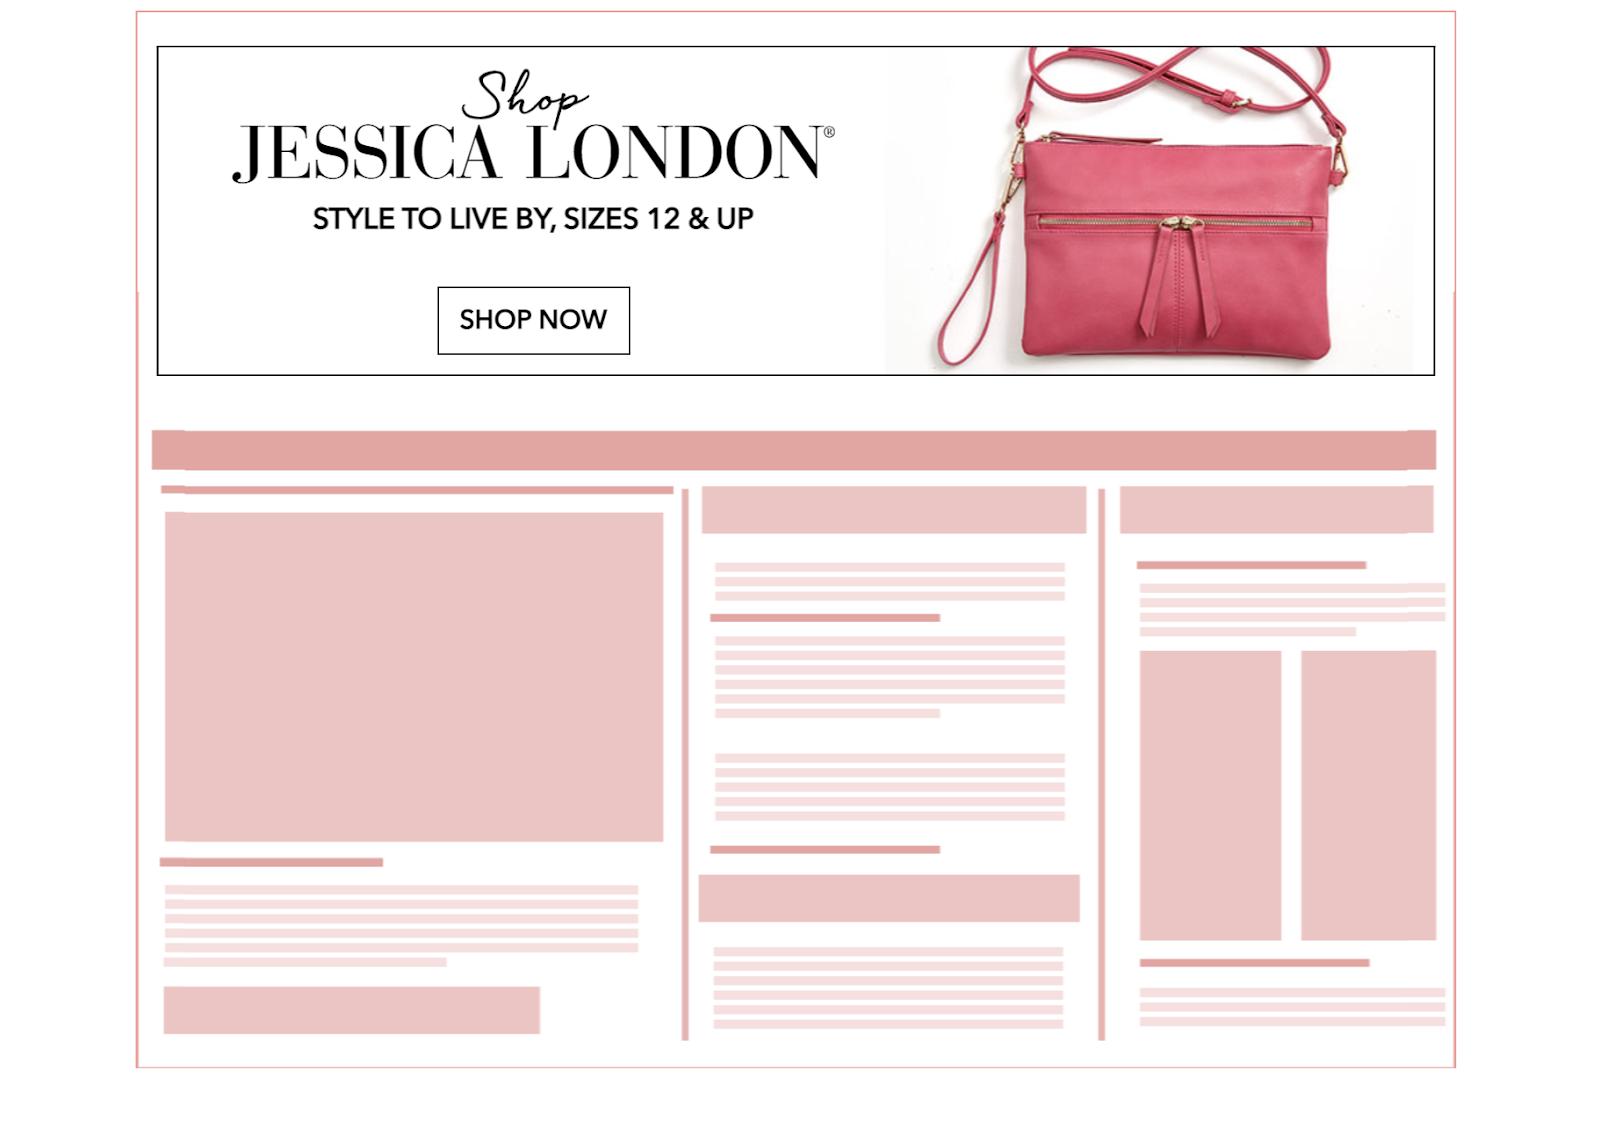 Jessica London Rich Media Banner Ad